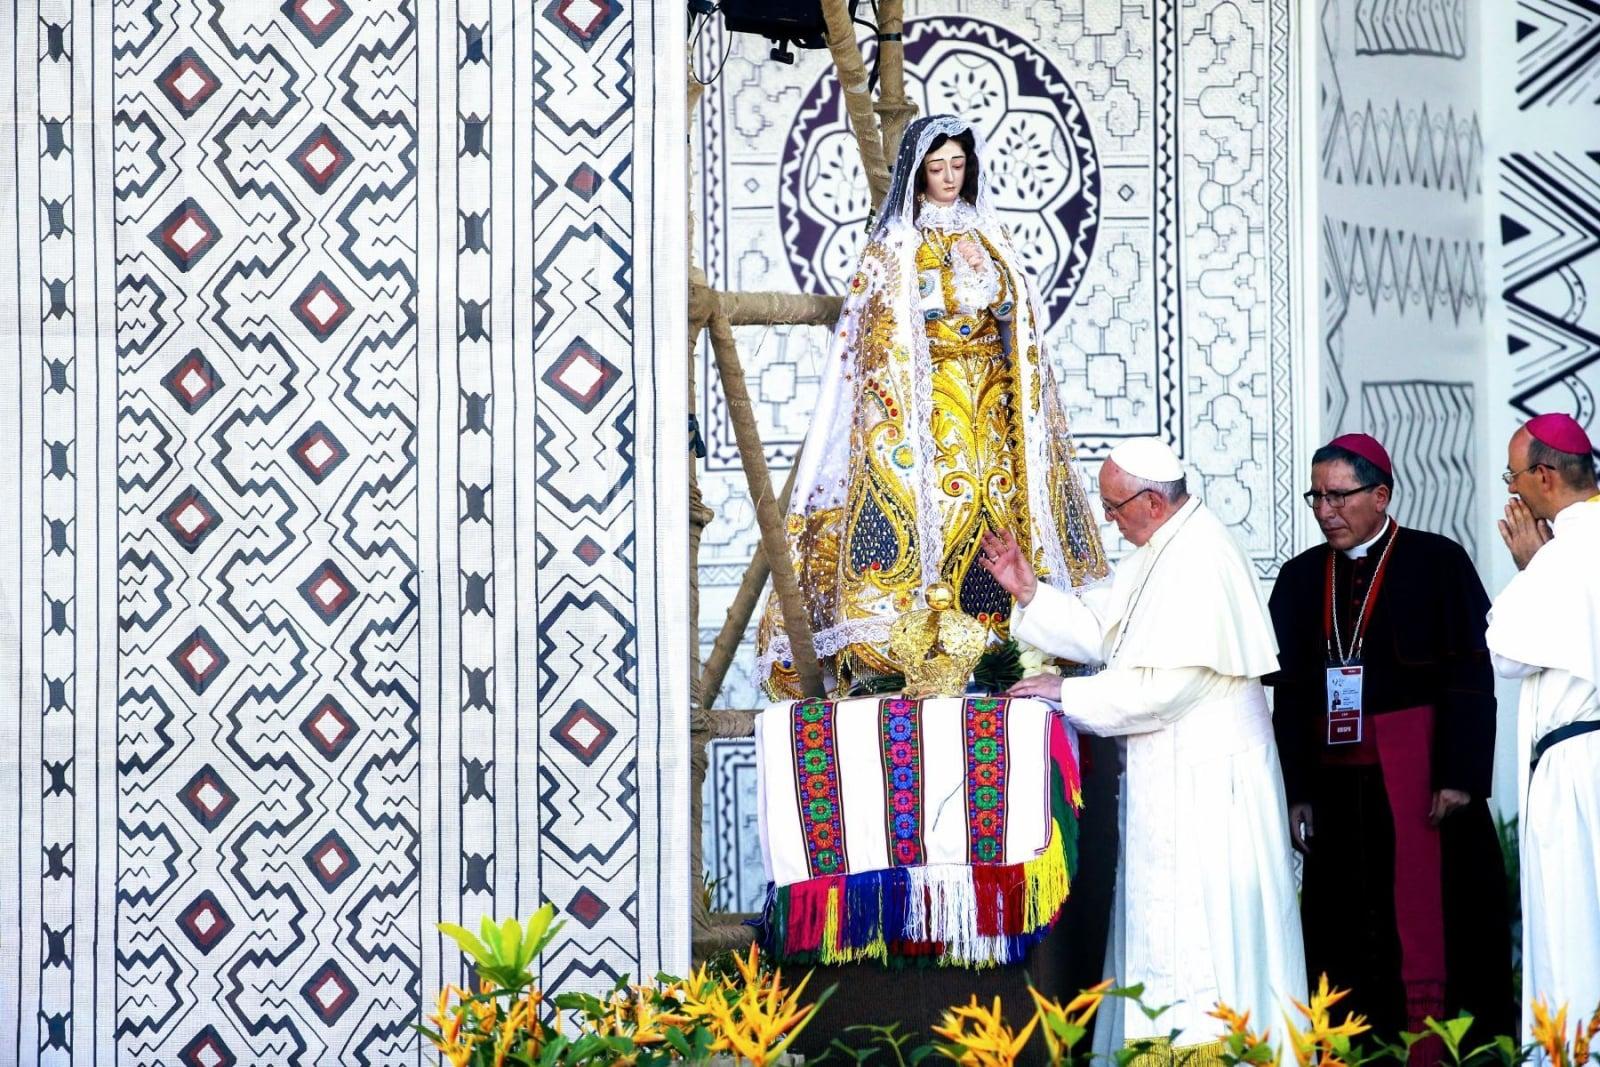 Papież Franciszek w Peru  EPA/LUIS IPARRAGUIRRE